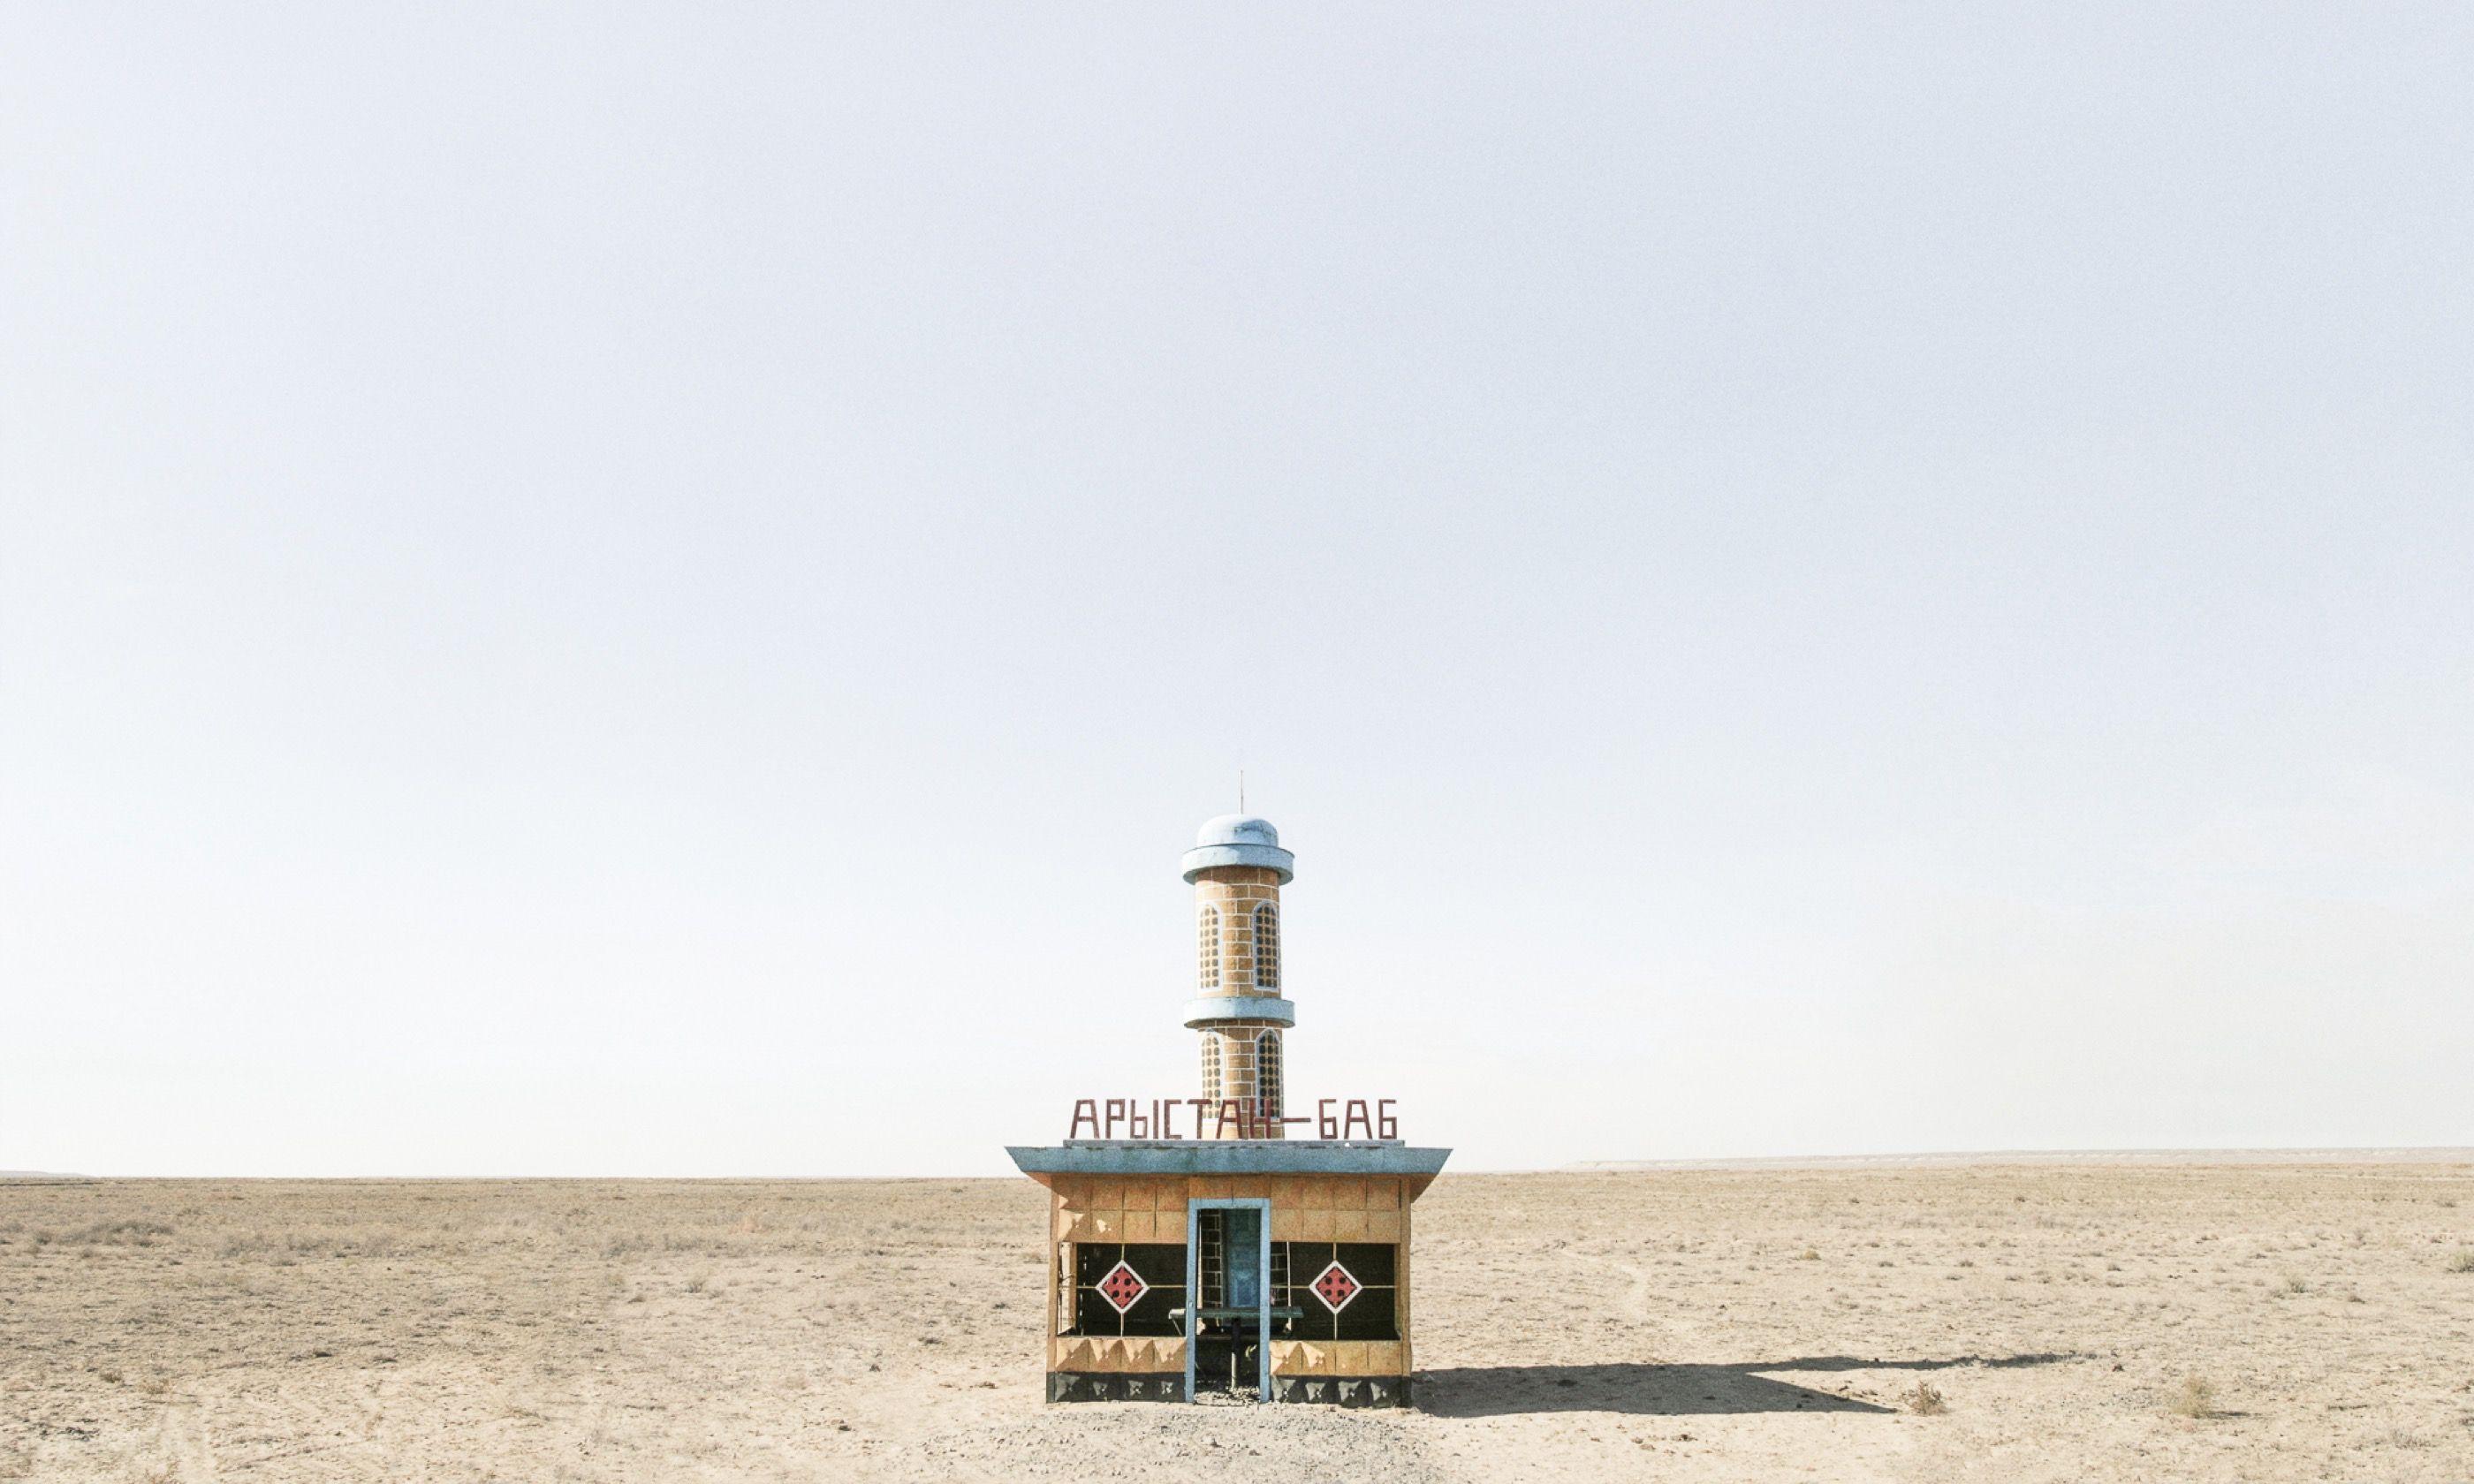 Aralsk, Kazakhstan (Christopher Herwig)